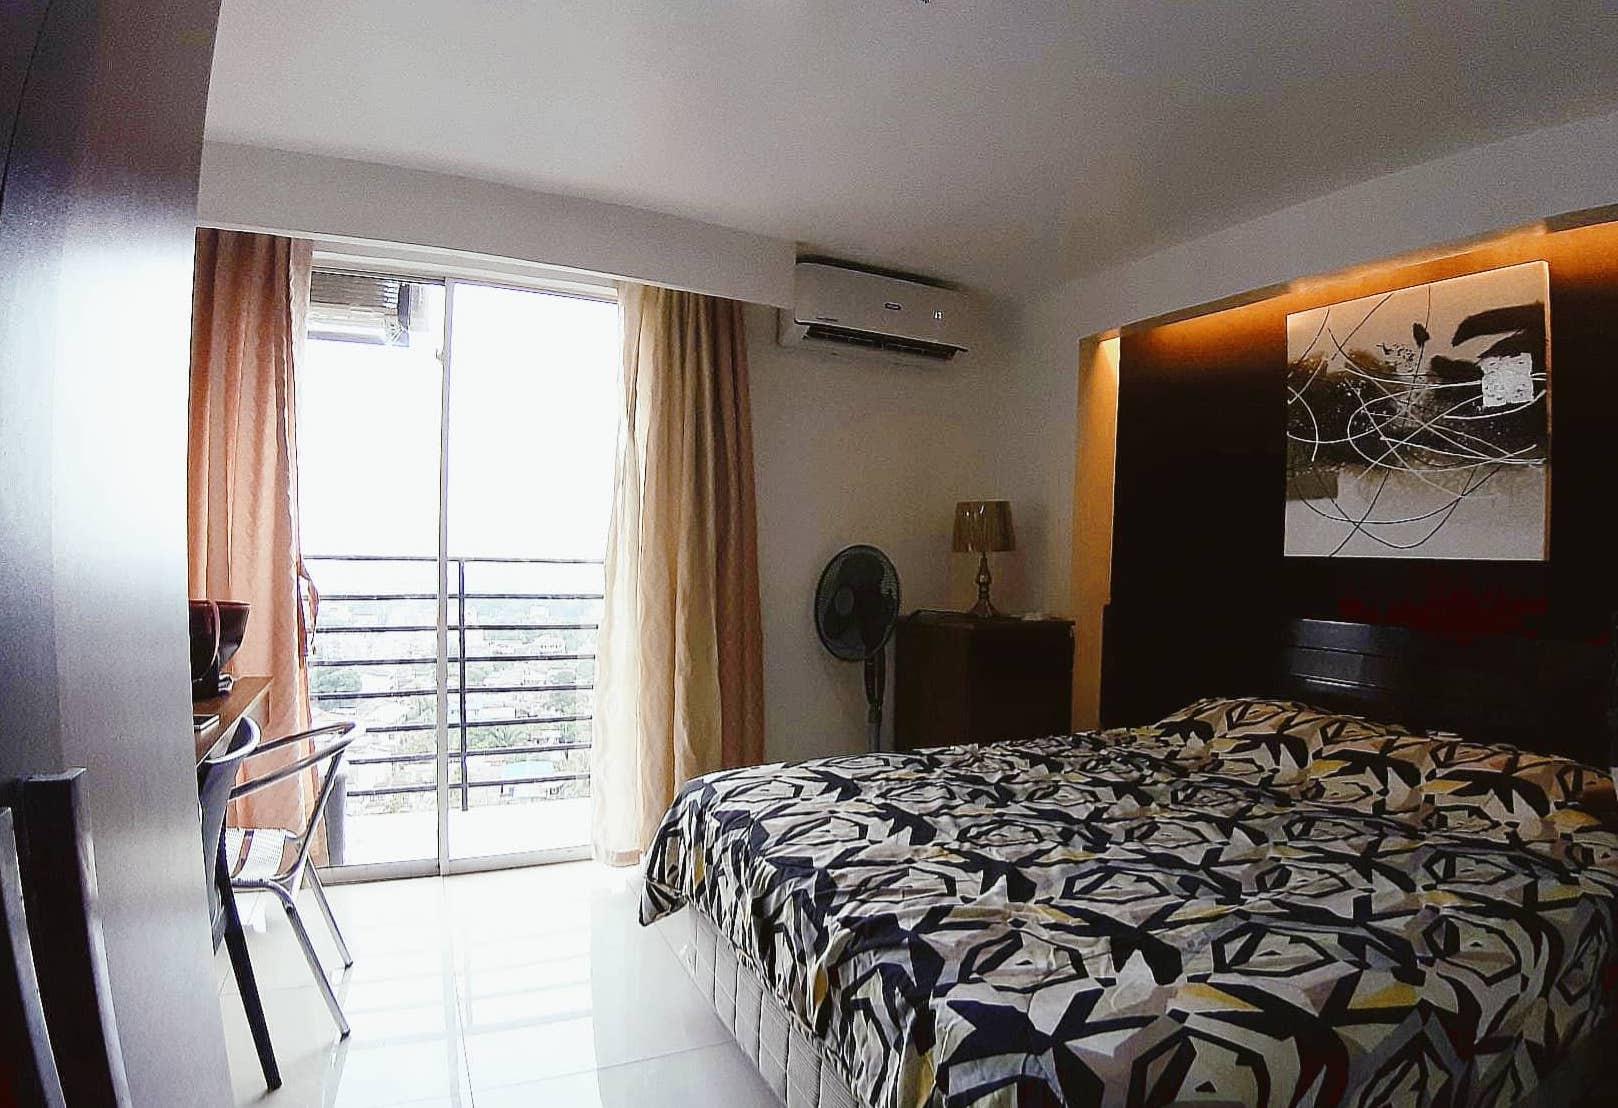 For Rent Furnished Studio Cityscape Tower Mandaue Cebu